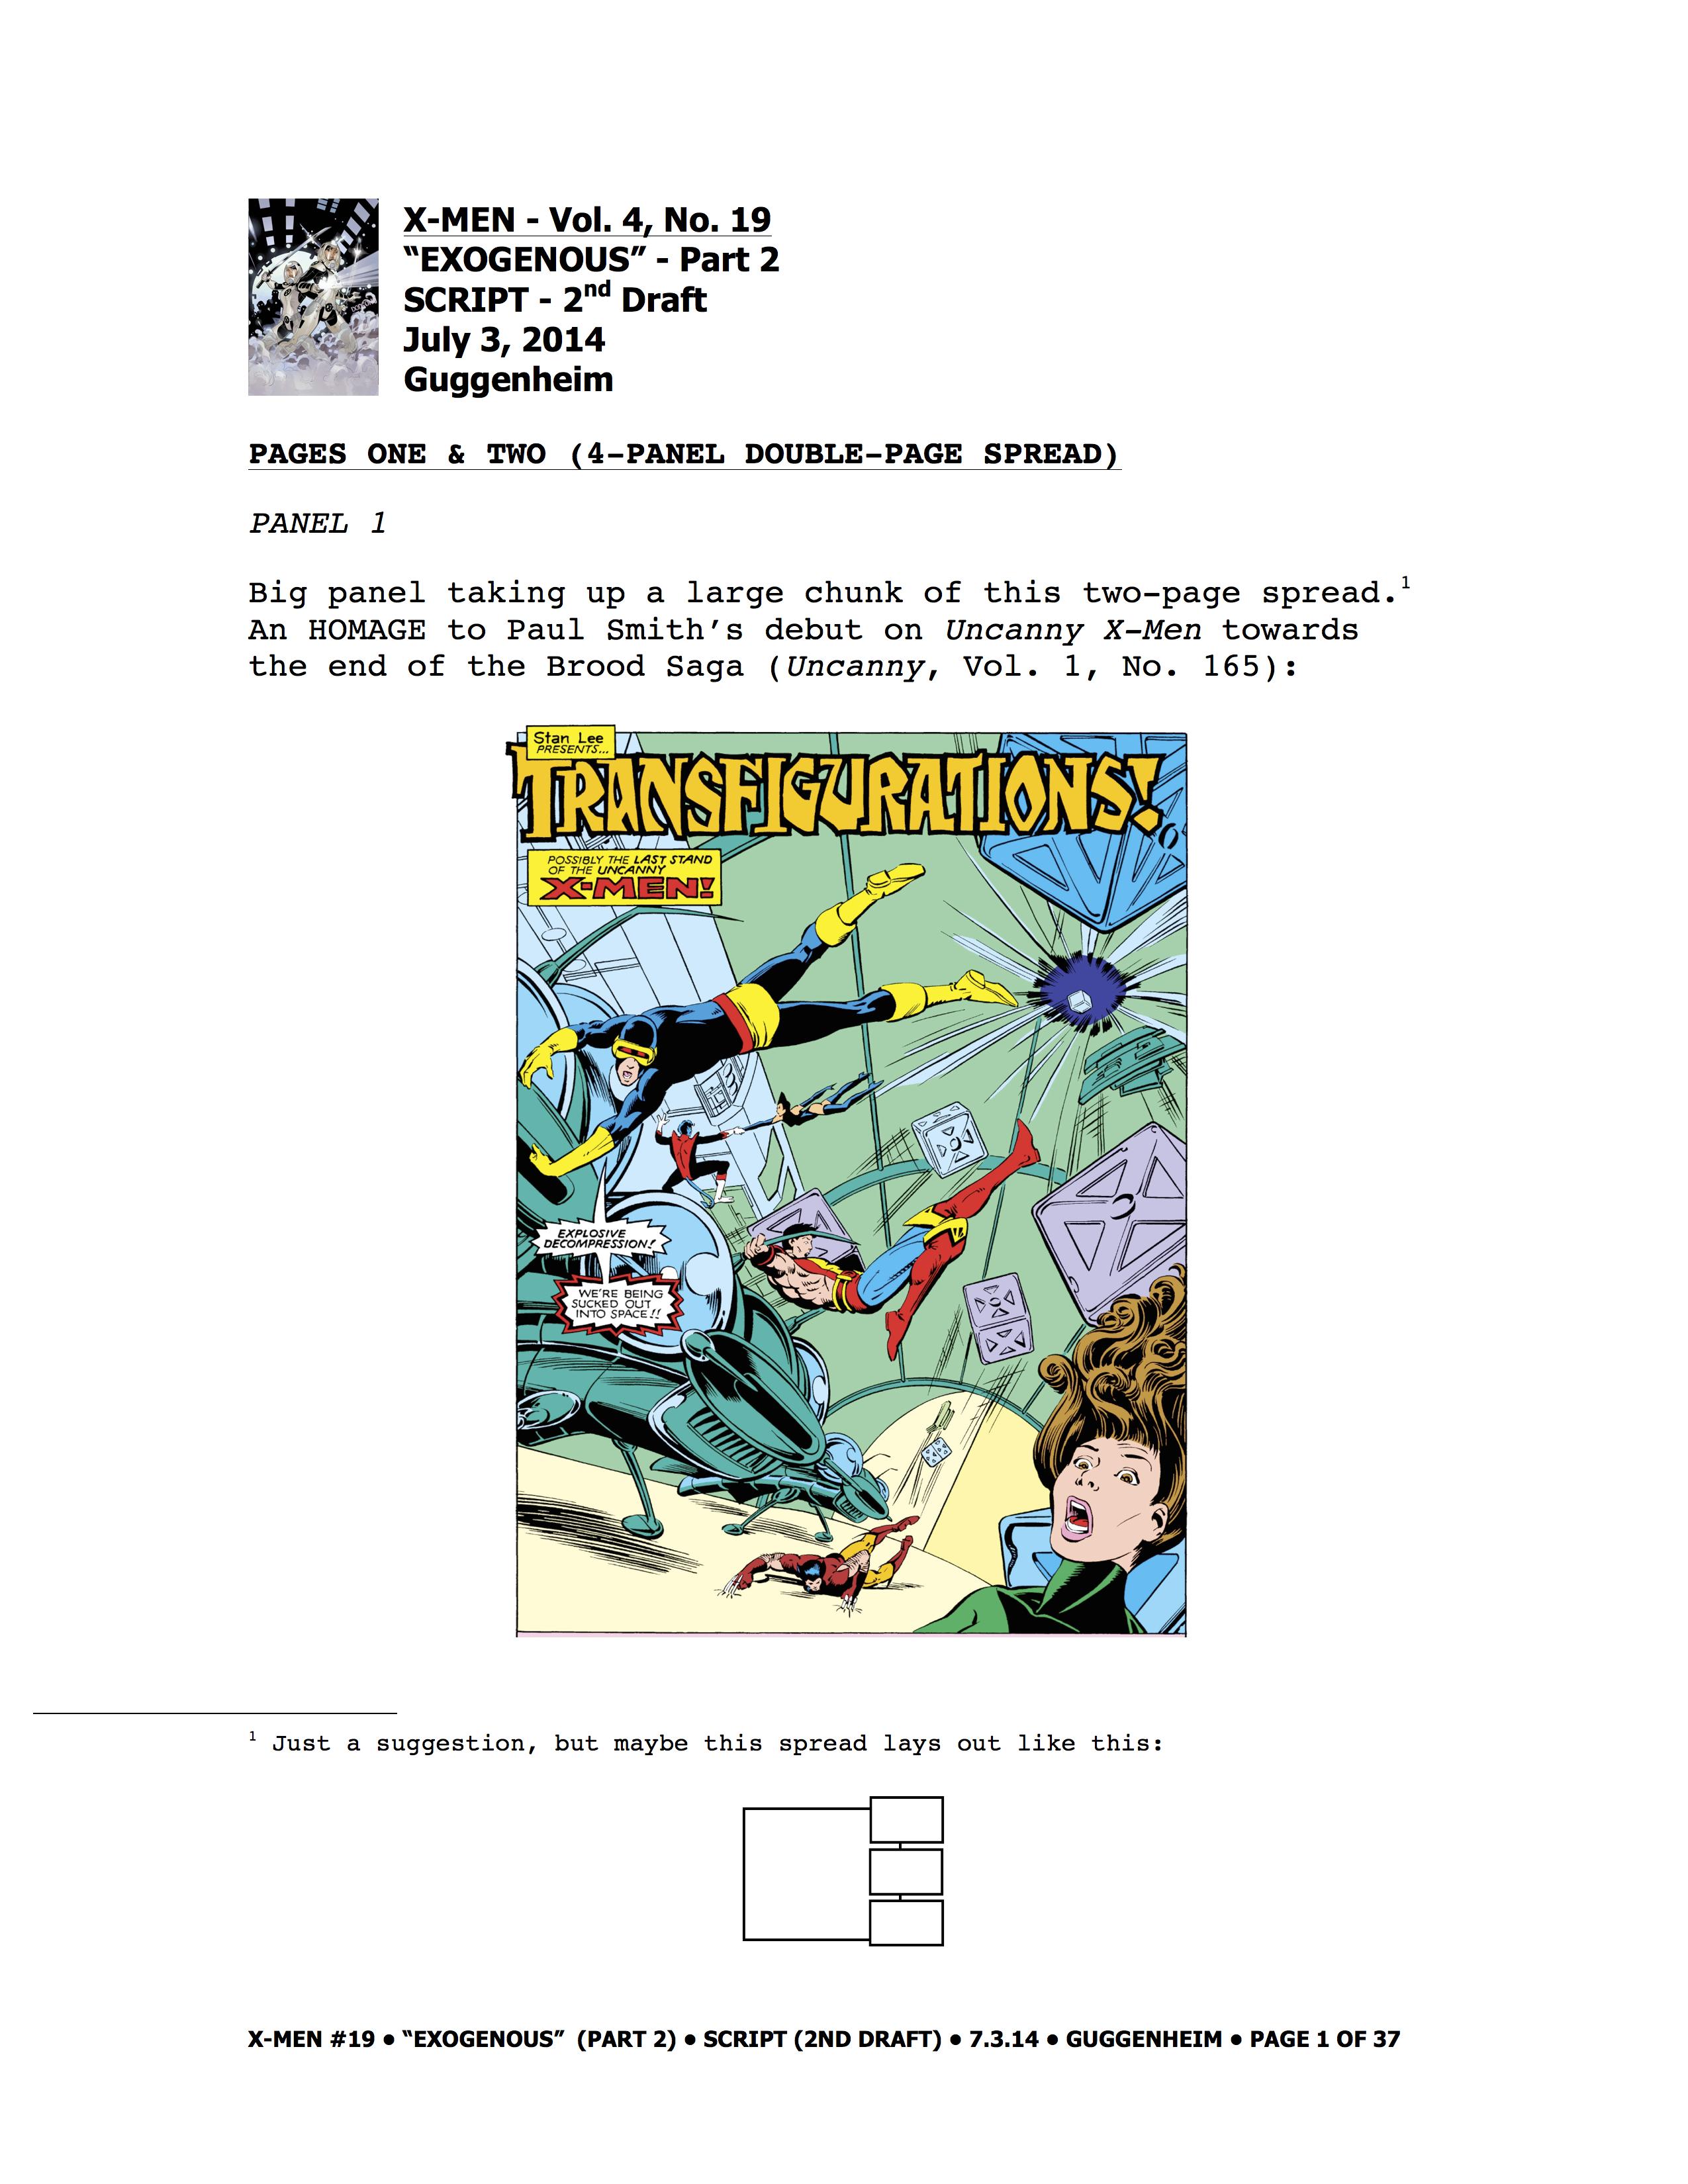 X-Men (Vol. 4) #19 - Script 2nd Draft CLEAN (MGG 7.3.14).jpg